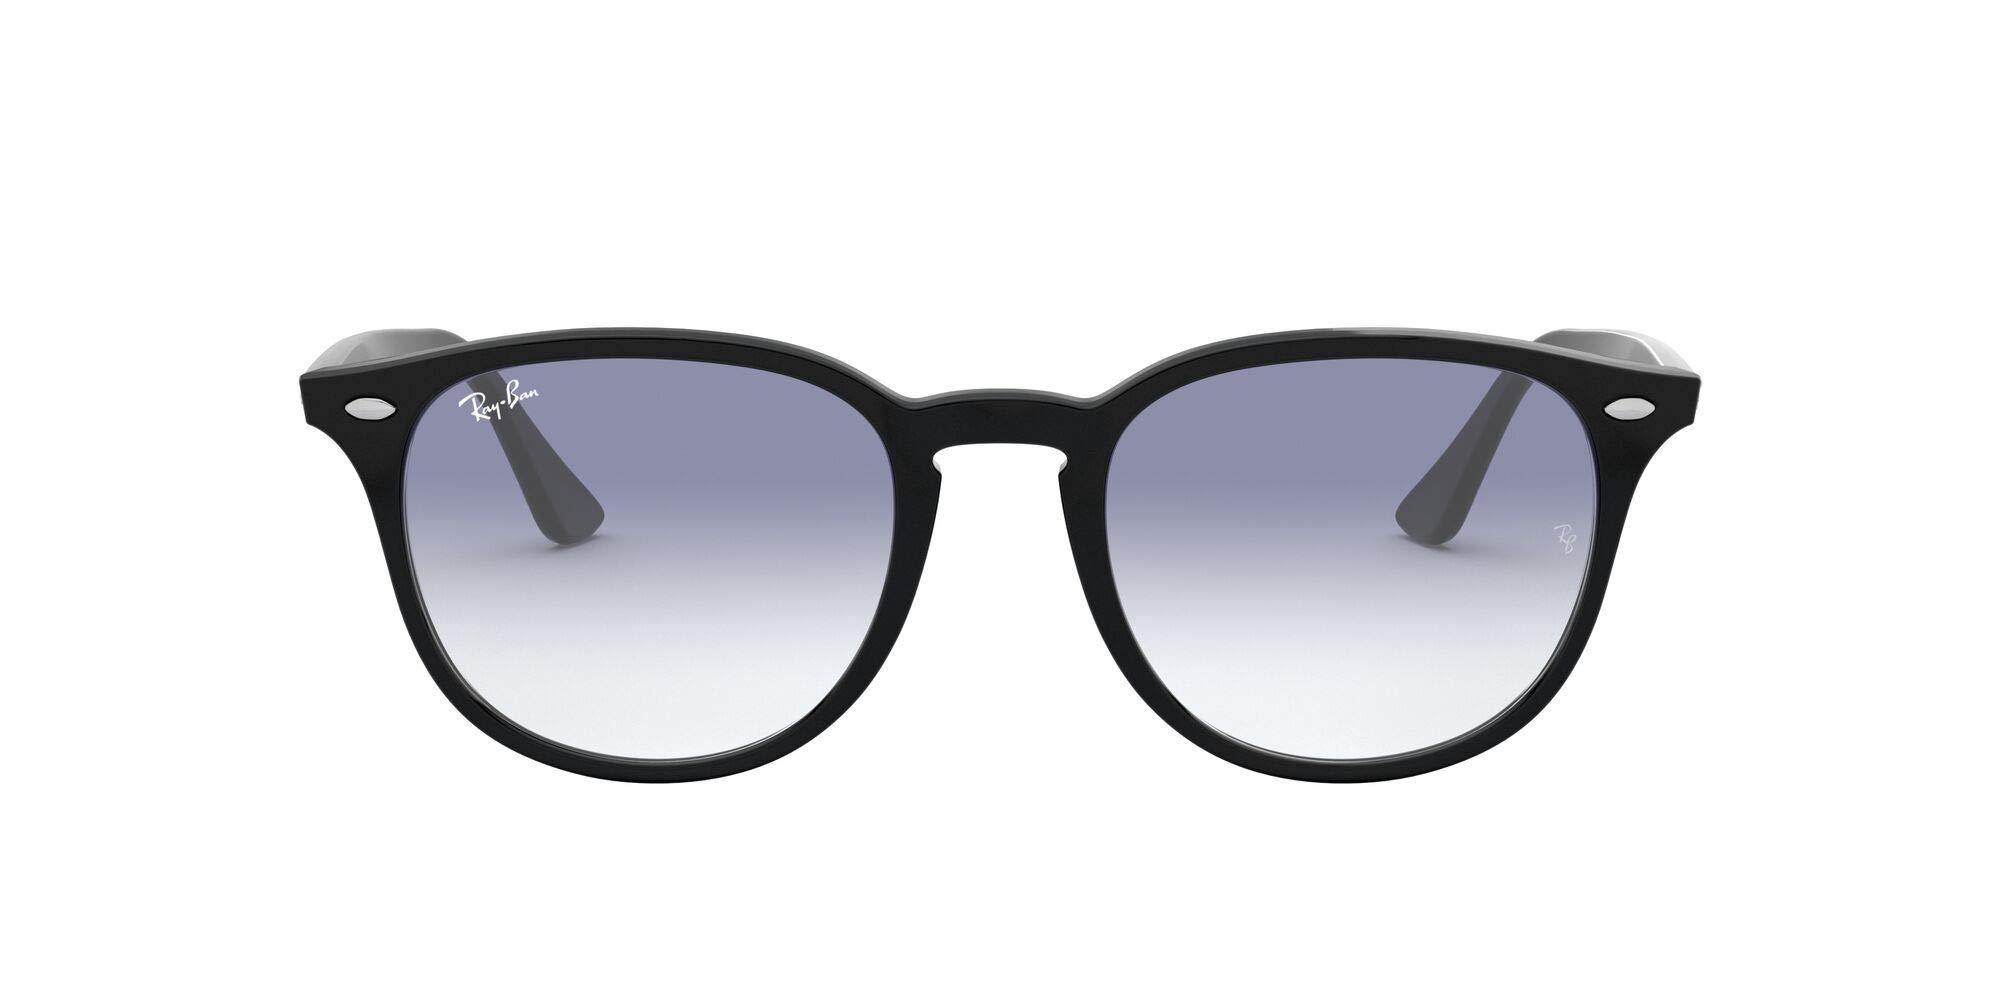 Ray-Ban unisex-adult Rb4259 Round Sunglasses Round Sunglasses